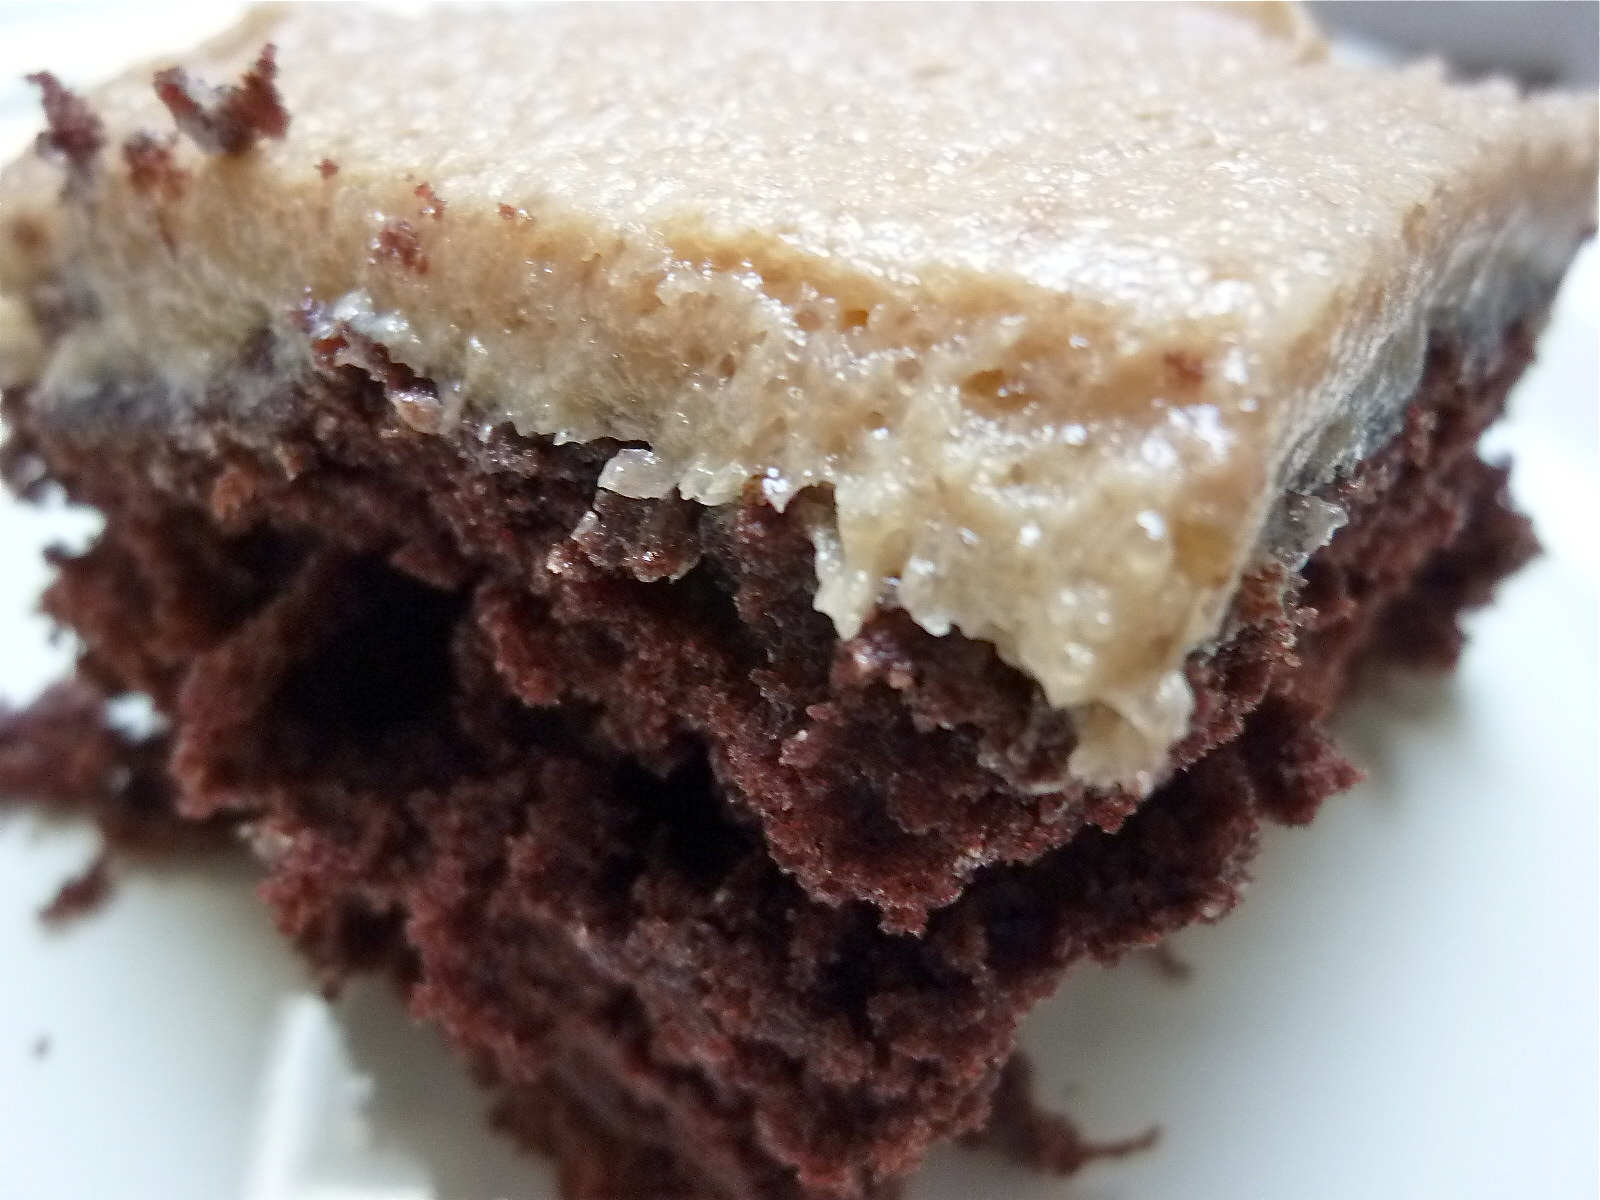 Spice cake recipe caramel frosting